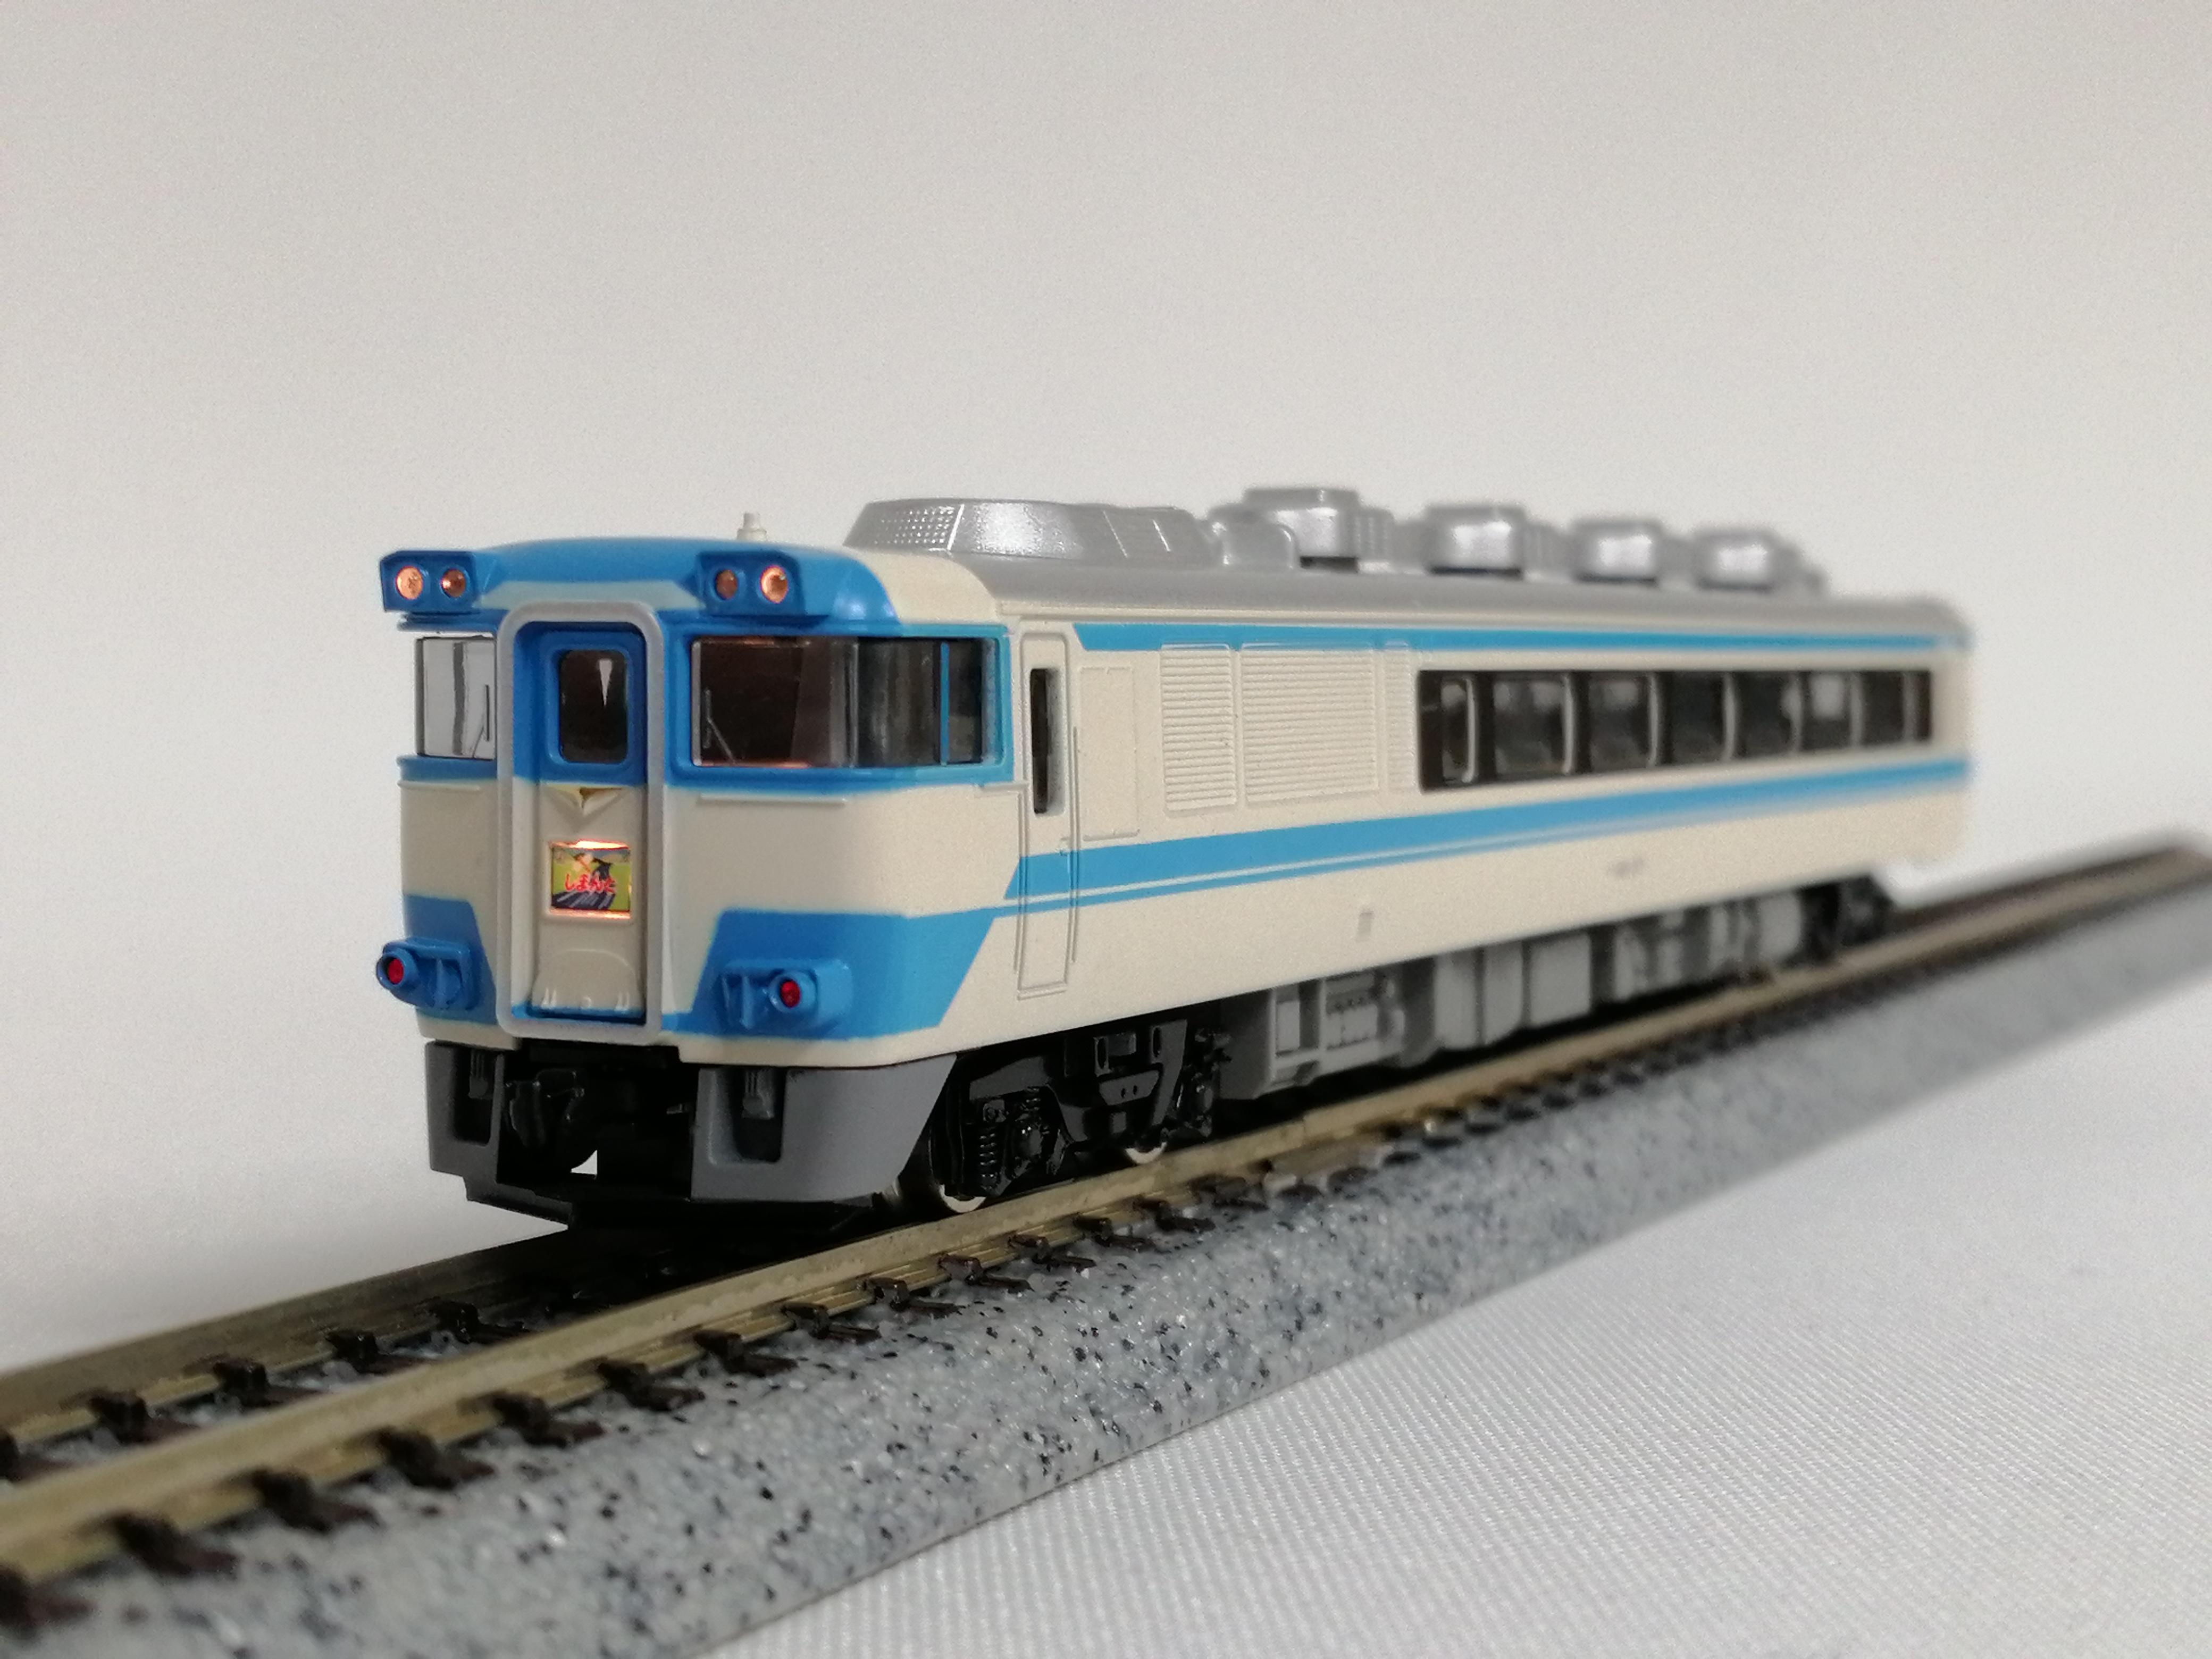 Nゲージ JR181系特急ディーゼルカー 四国色|TOMIX